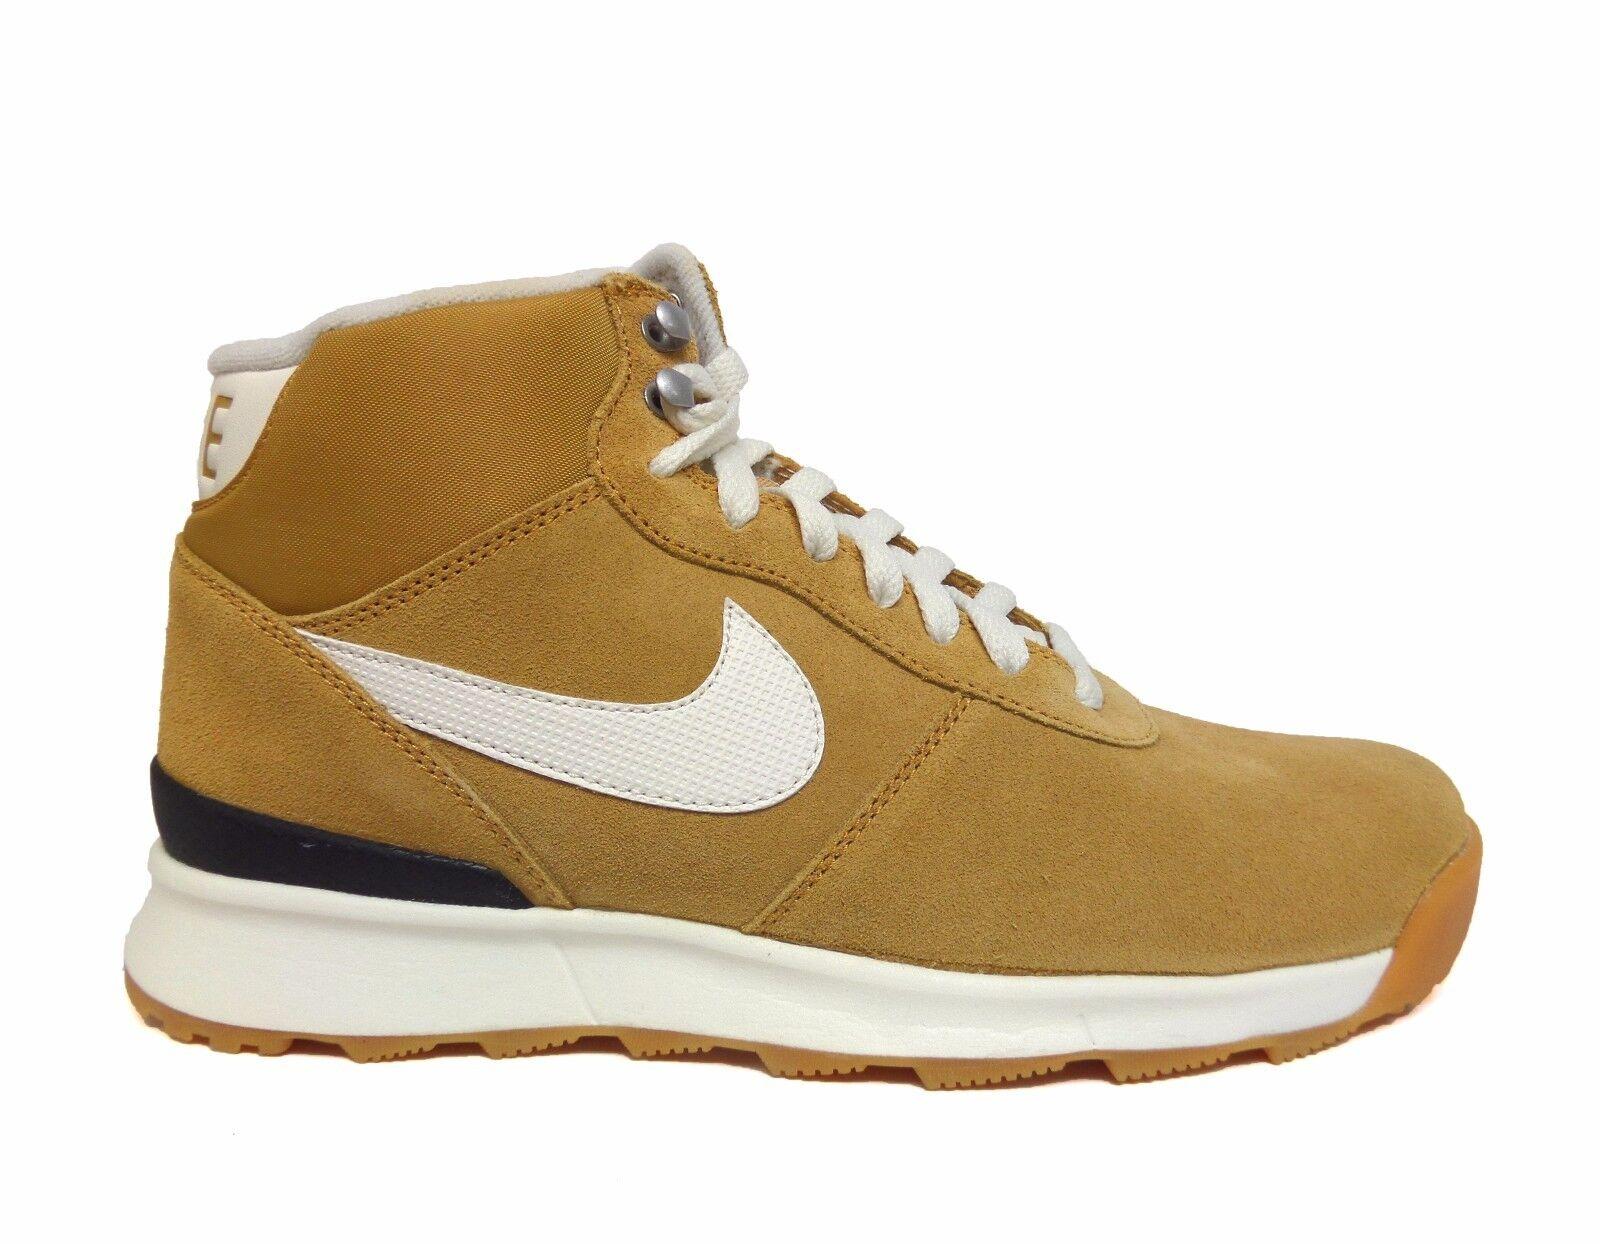 Nike Women's ACORRA SUEDE Sneakerboots Haystack/Light Brown 806977-710 a1